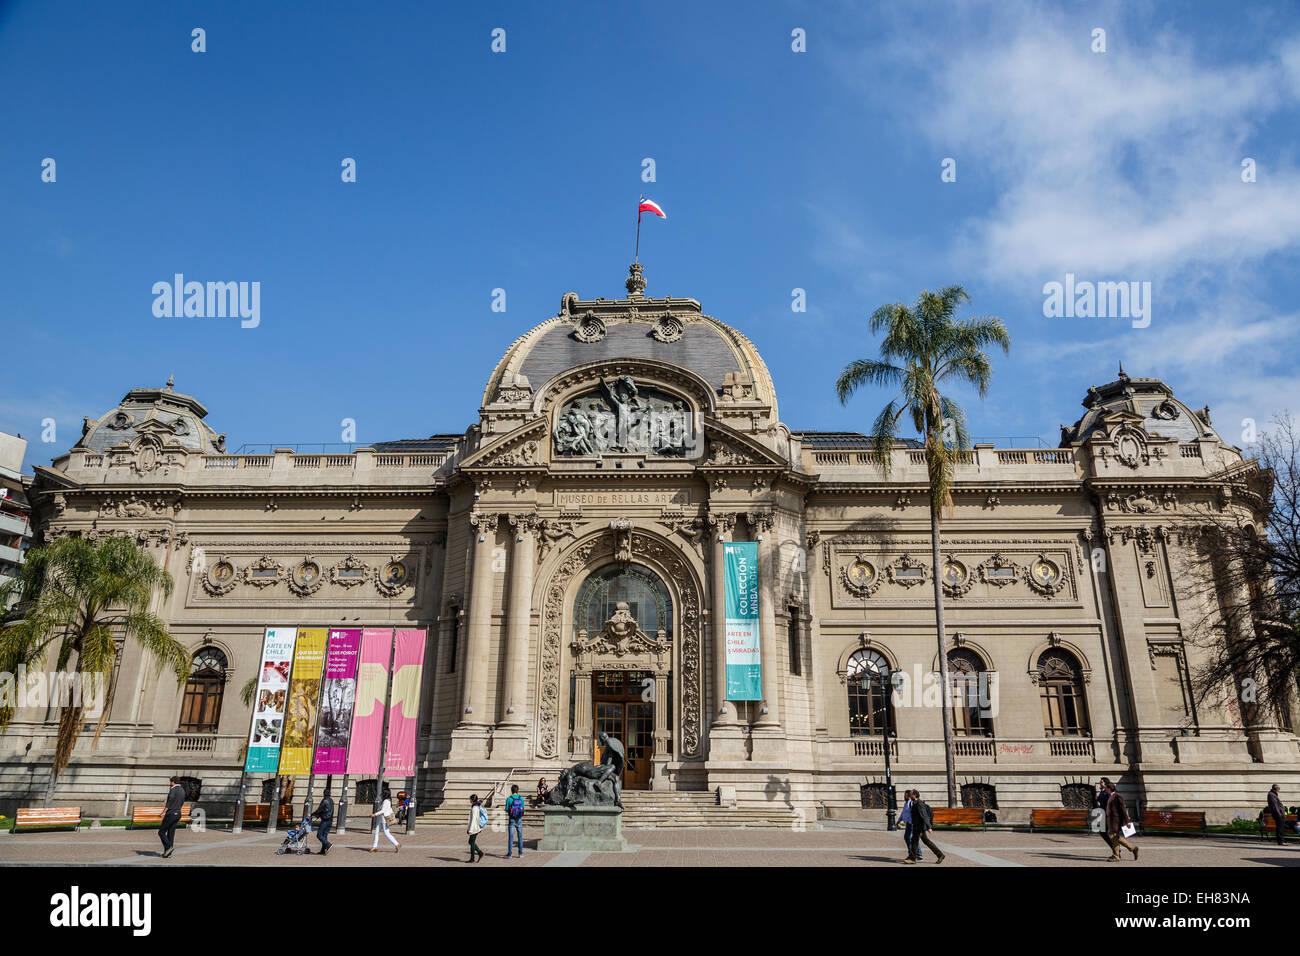 Museo Nacional de Bellas Artes (Chilean National Museum of Fine Arts), Santiago, Chile, South America - Stock Image